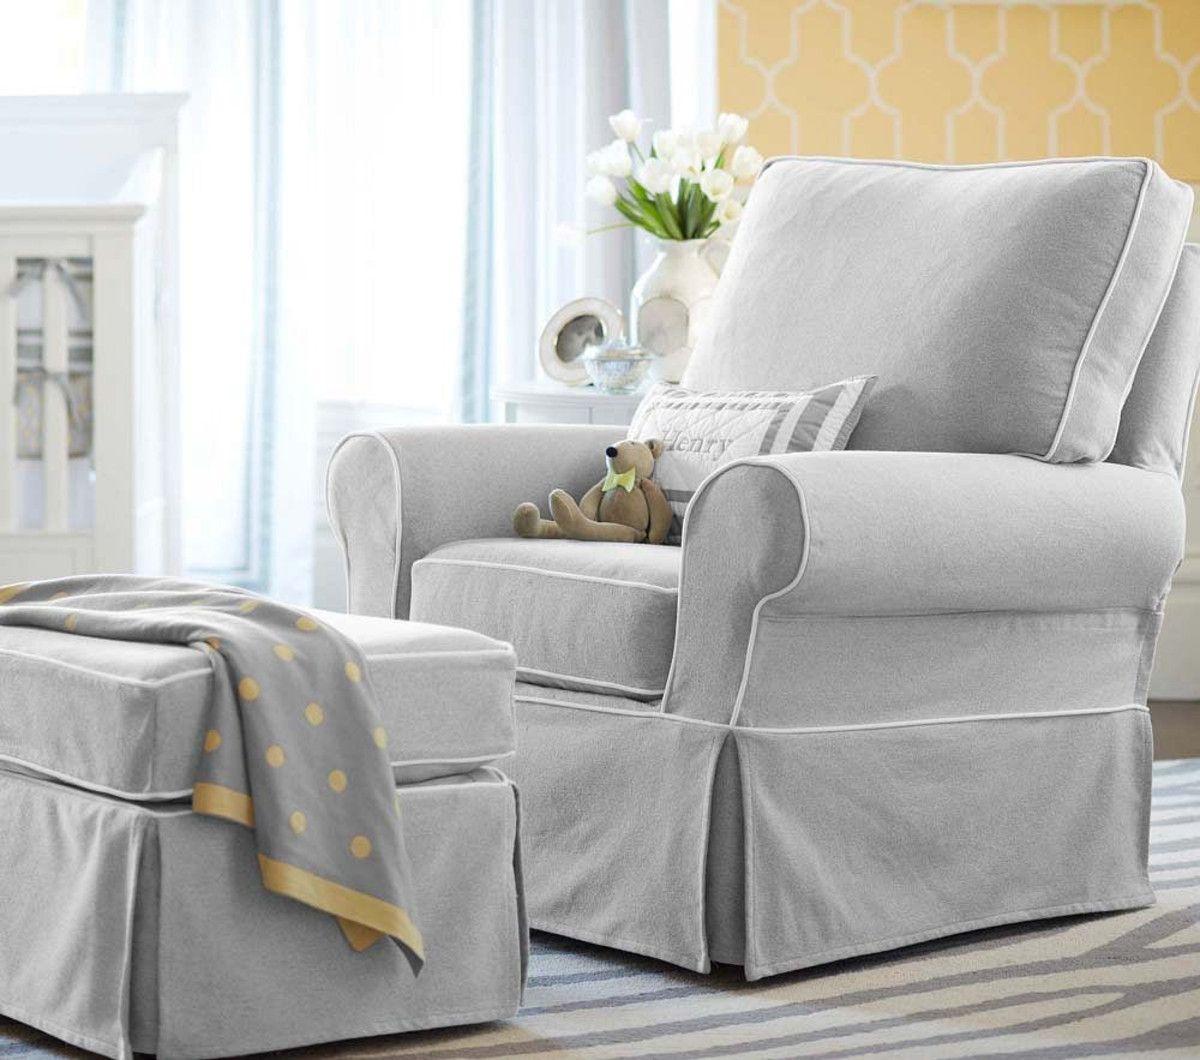 The Most Comfortable Nursing Chair & Ottoman. Comfort ...